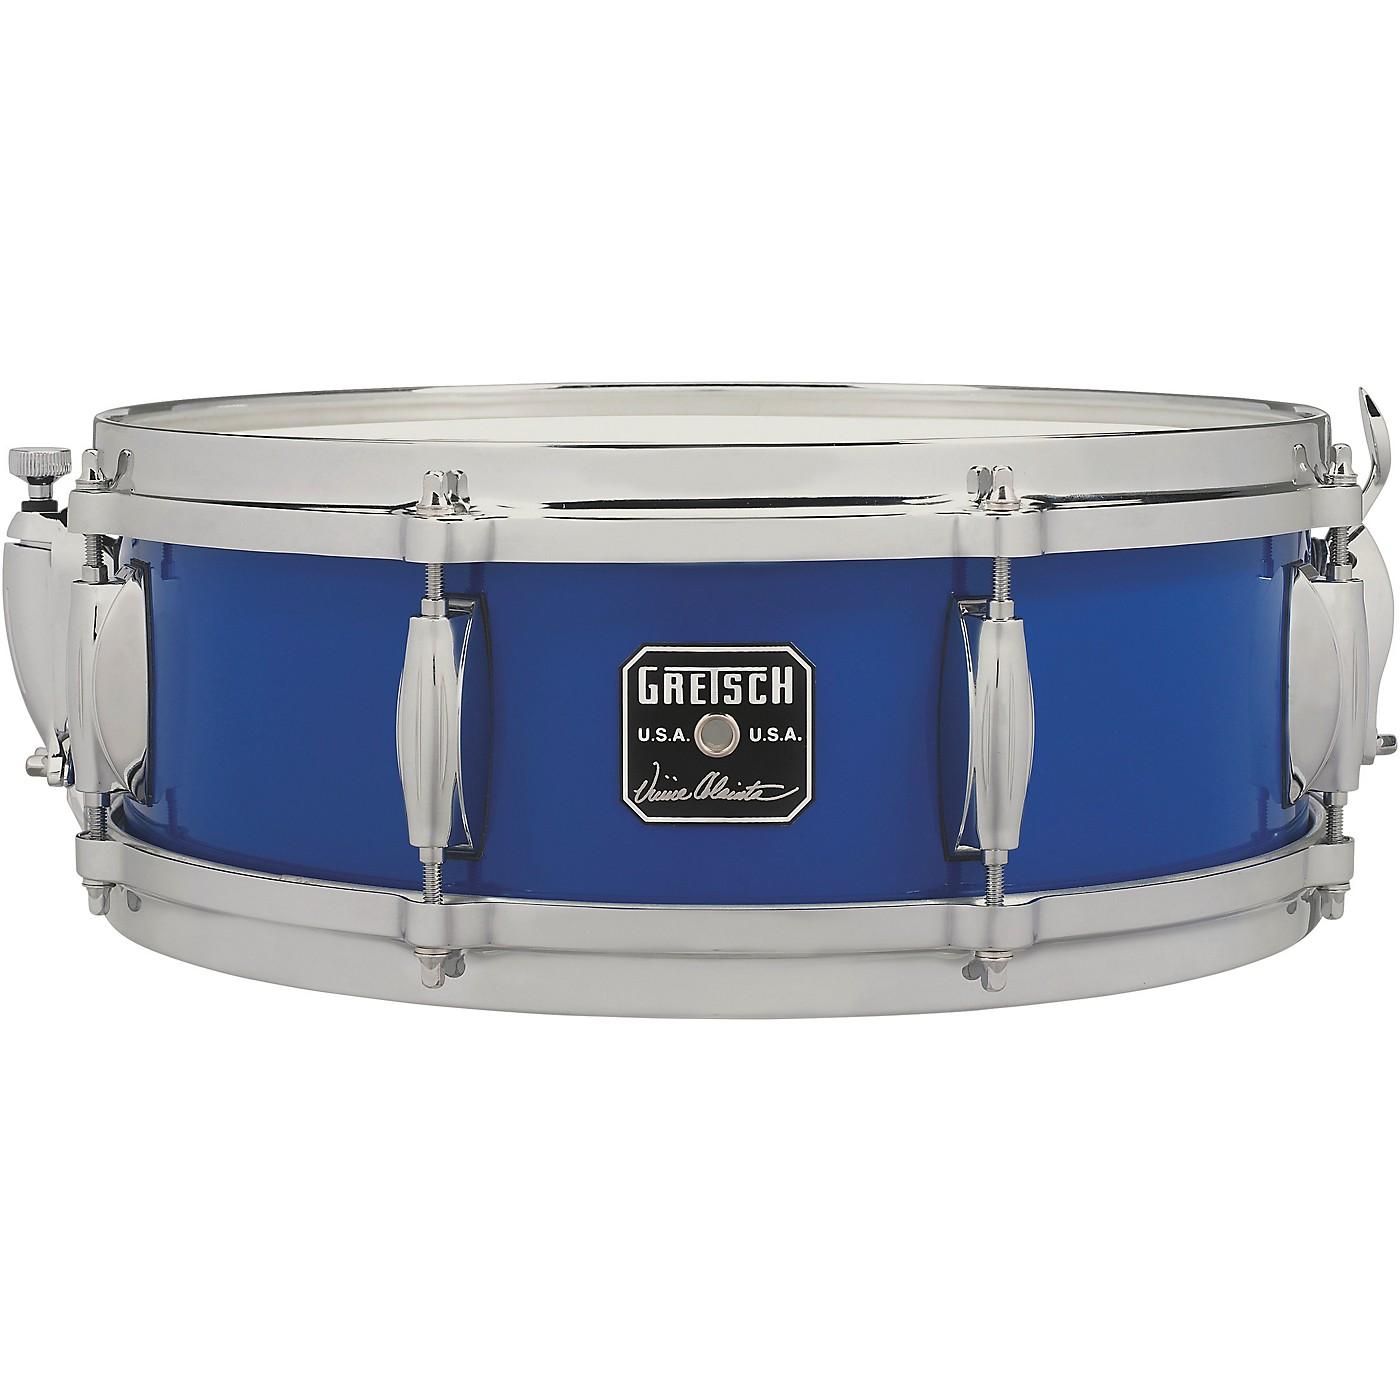 Gretsch Drums Vinnie Colaiuta Signature Snare Drum thumbnail